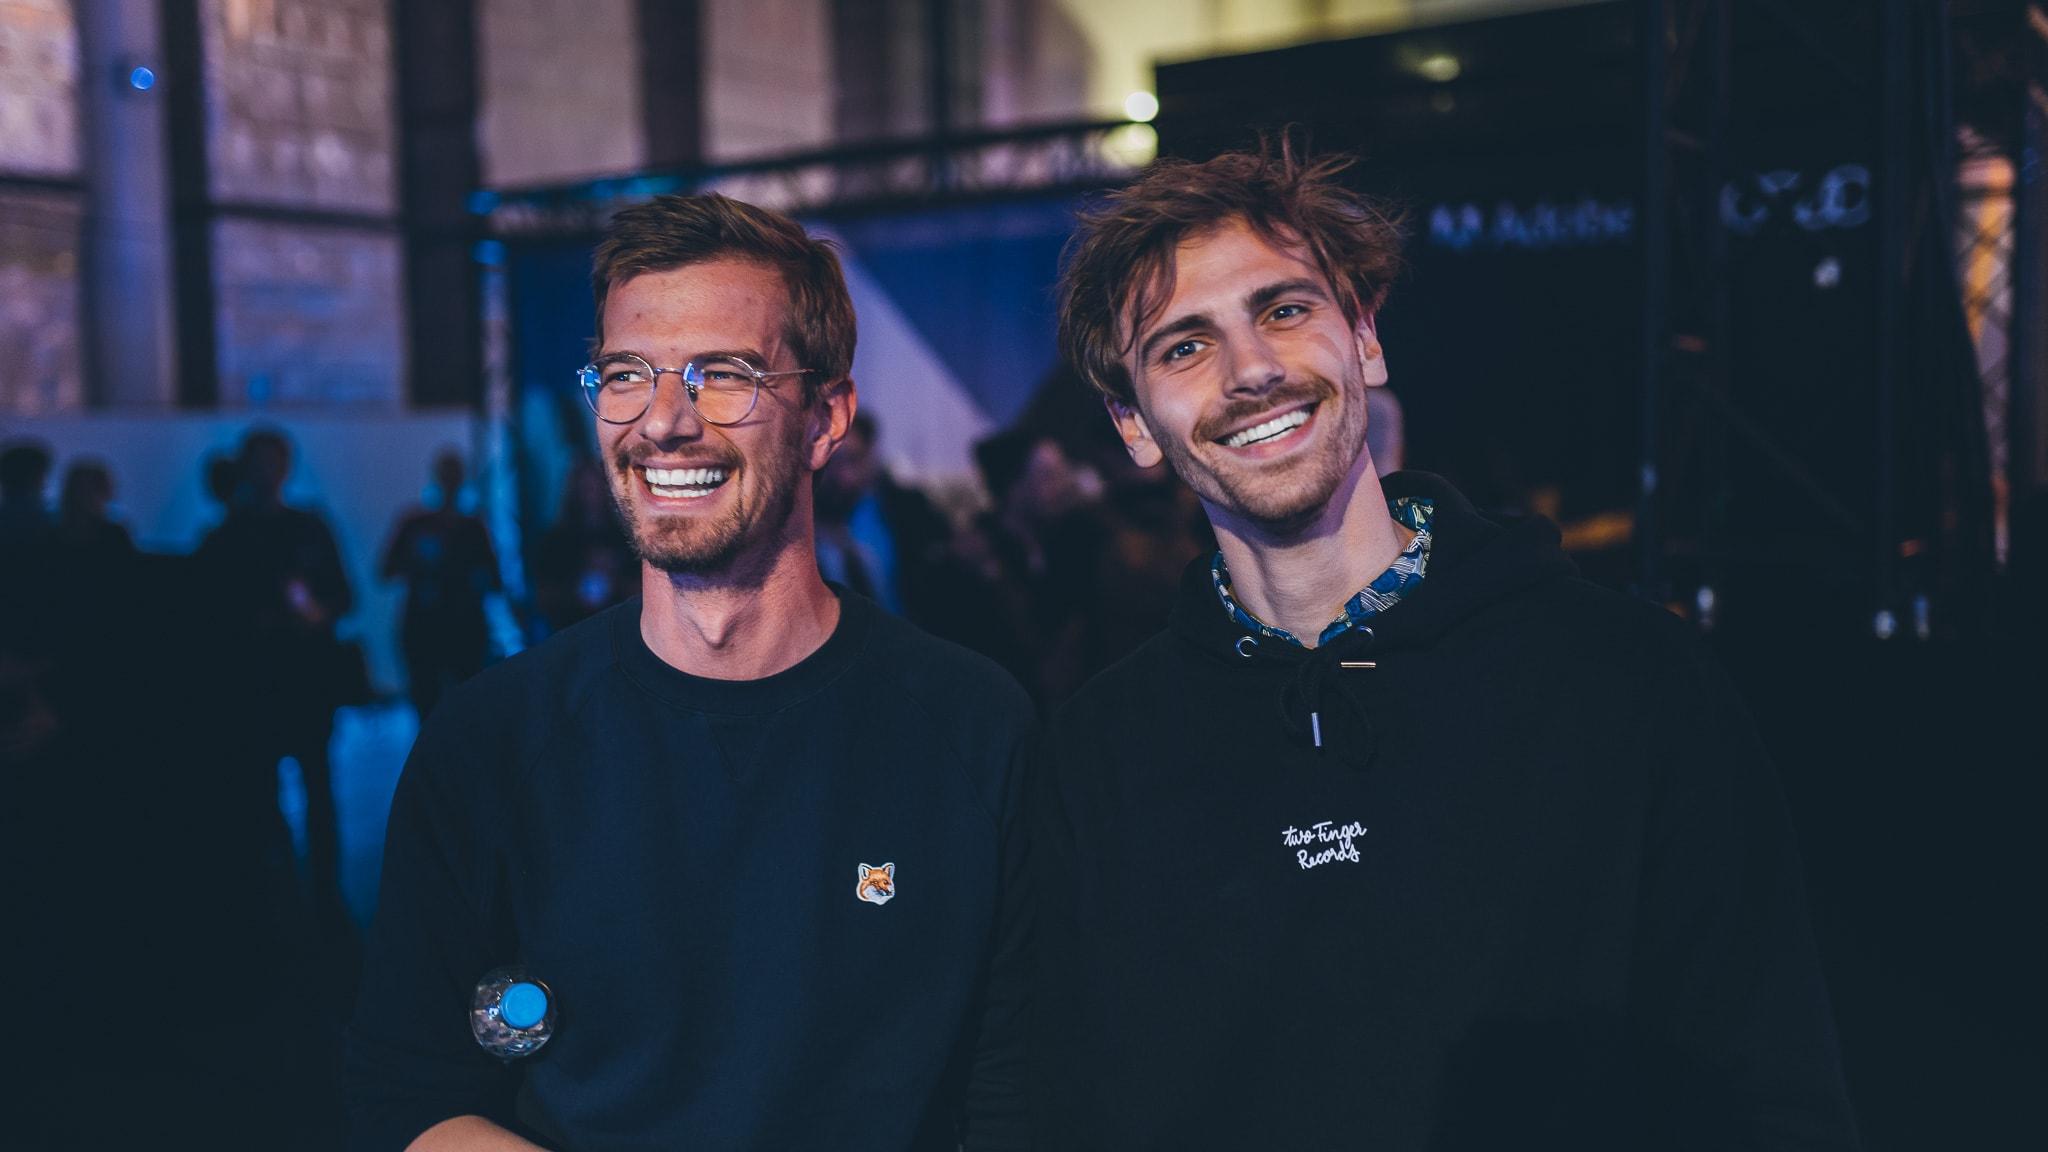 Joko Winterscheid & Fynn Kliemann @ OMR19